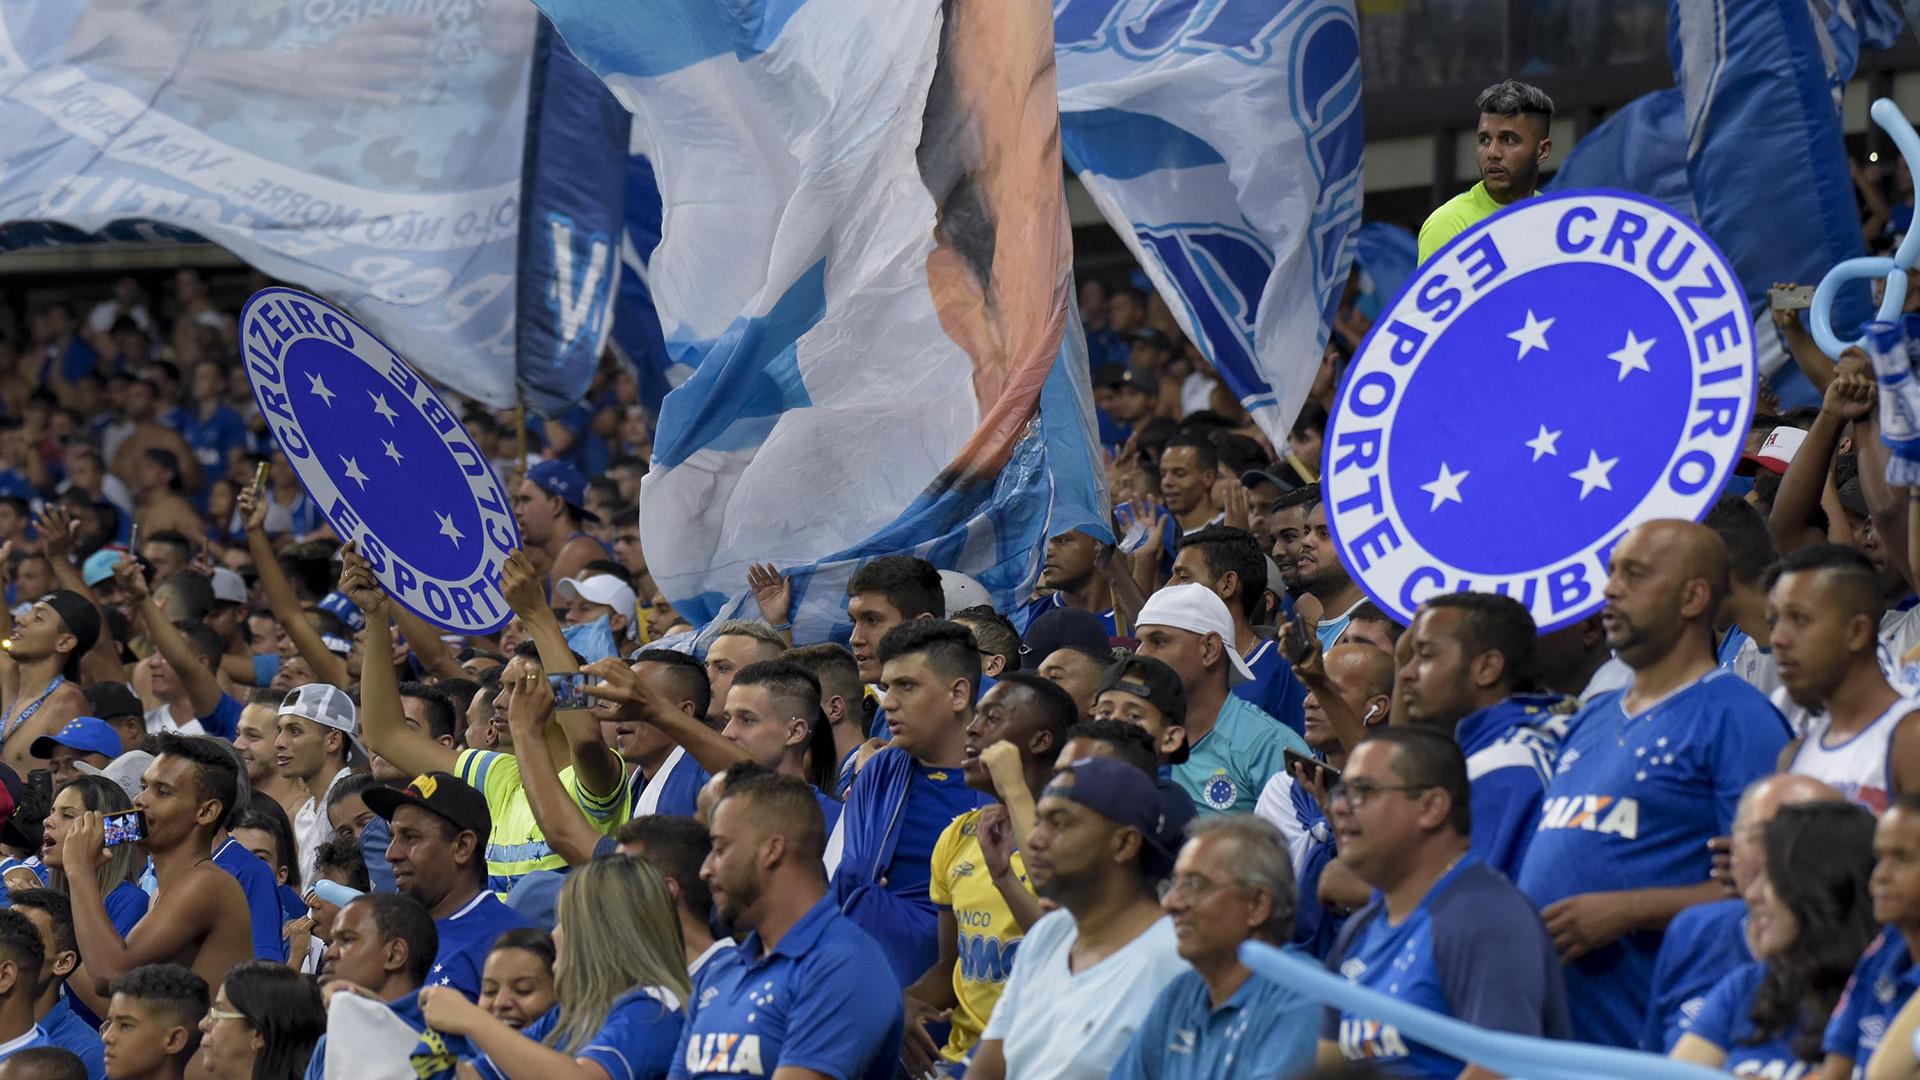 Torcida Cruzeiro Mineiro 17012018